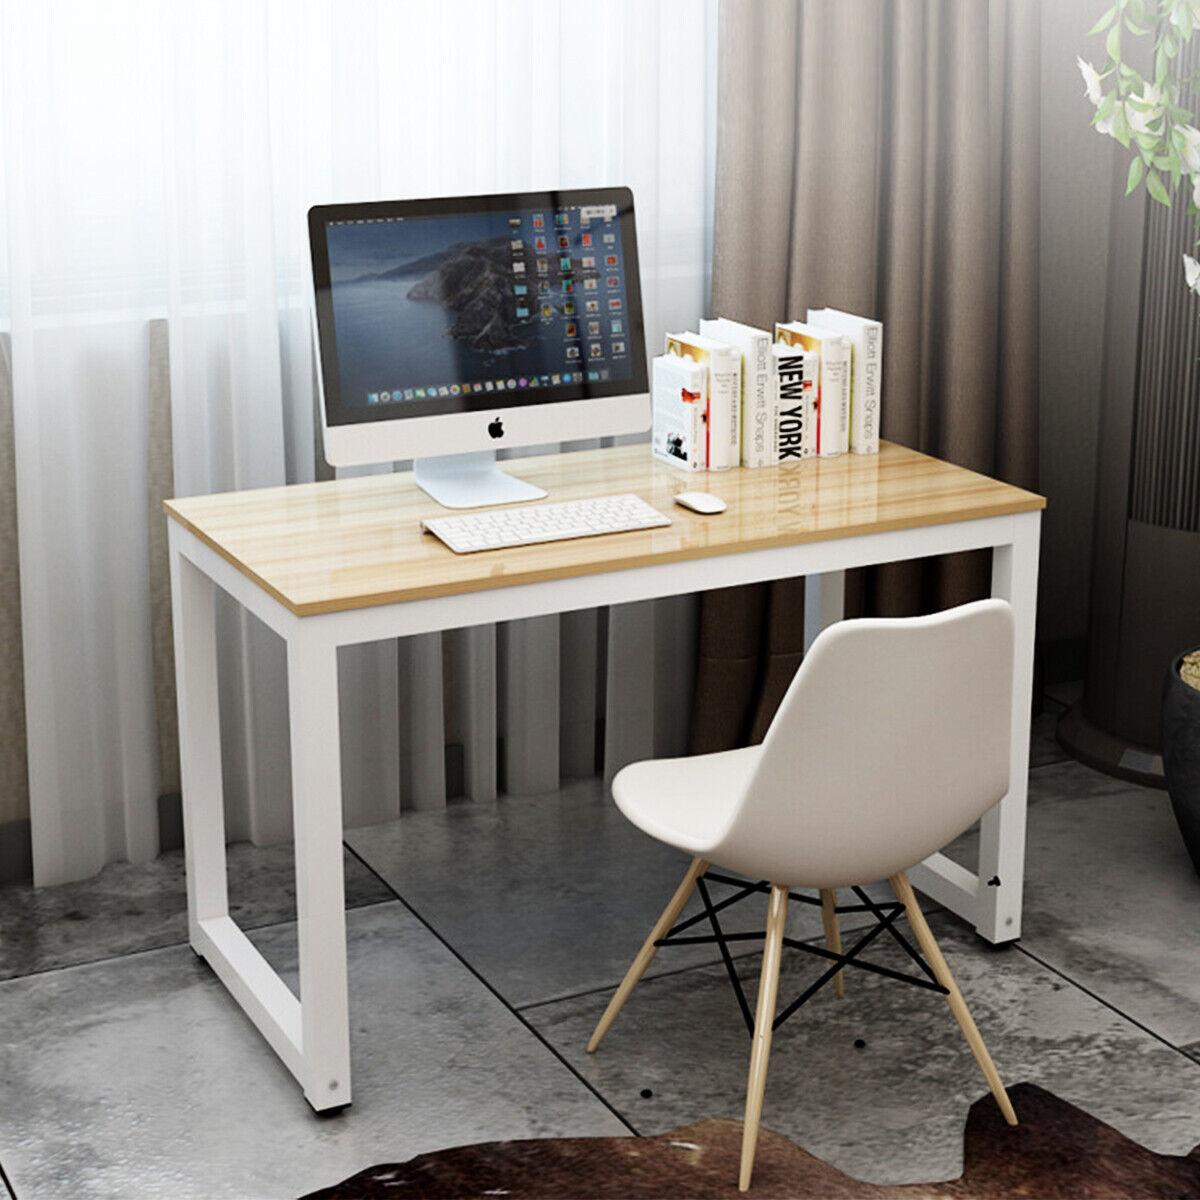 Sharp Lines Modern Desk Home Office Wood Study Writing Laptop File Drawer Gray For Sale Online Ebay